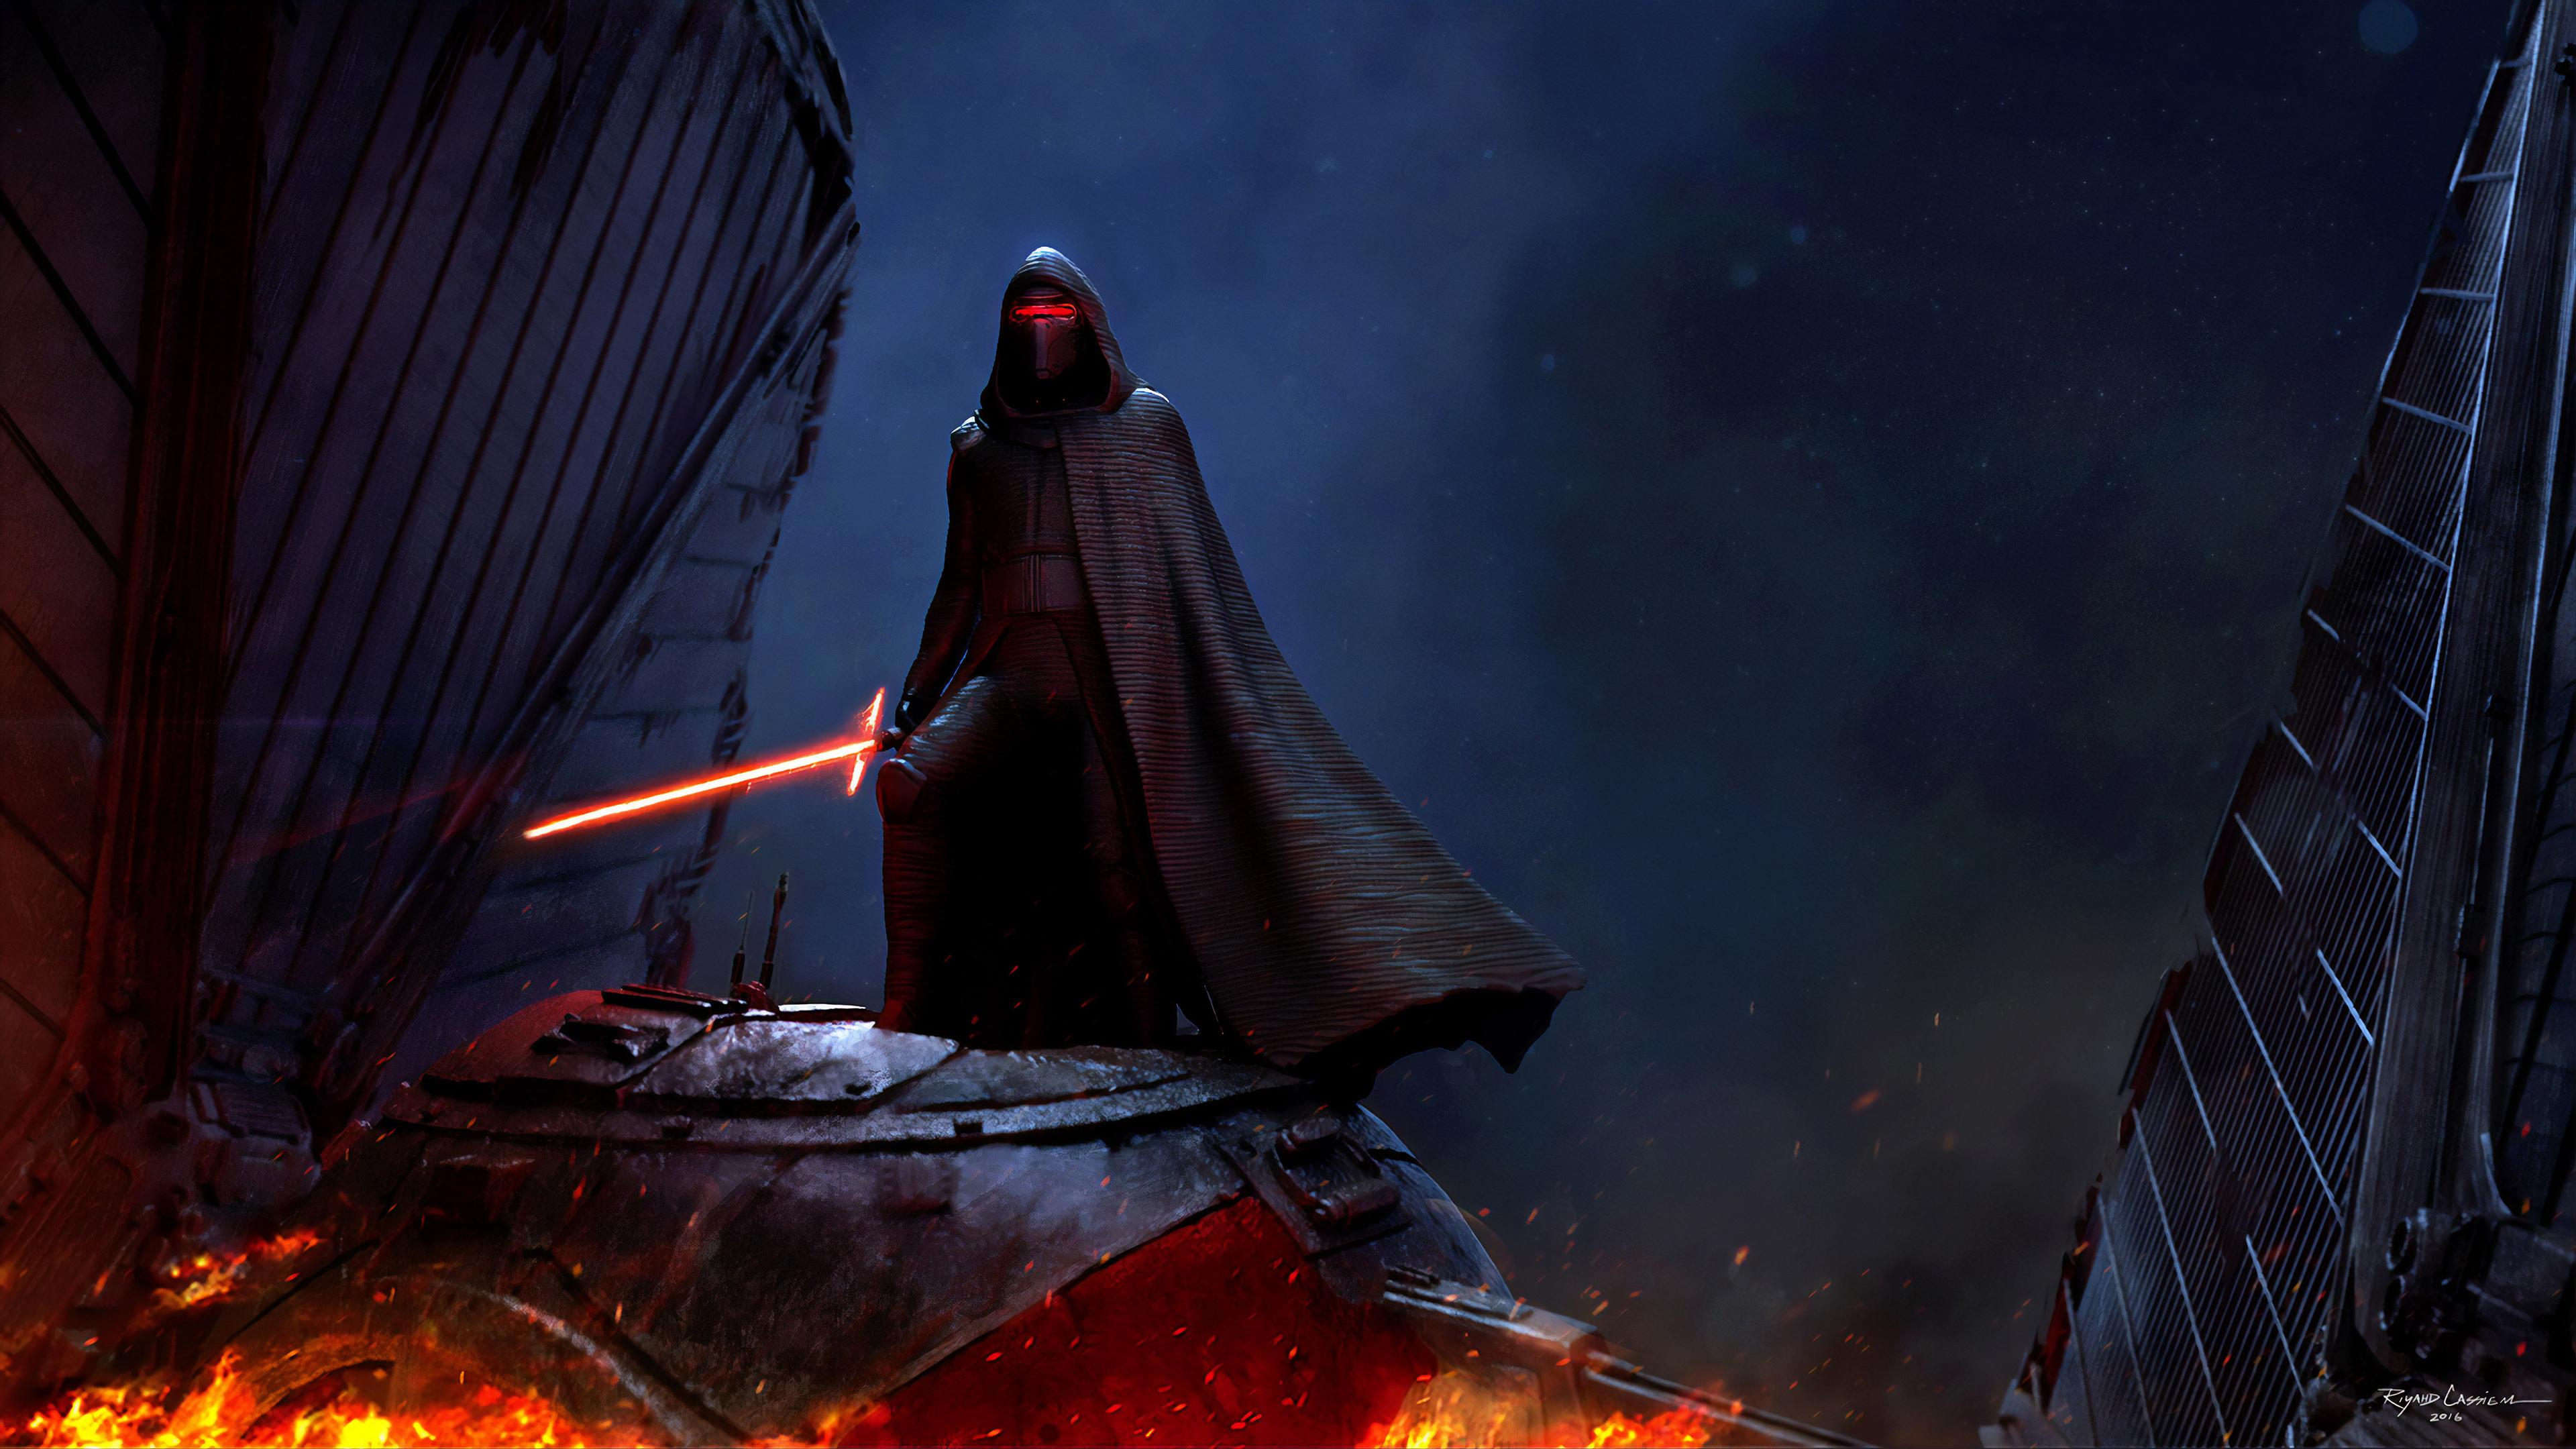 Kylo Ren Star Wars 4k Hd Superheroes 4k Wallpapers Images